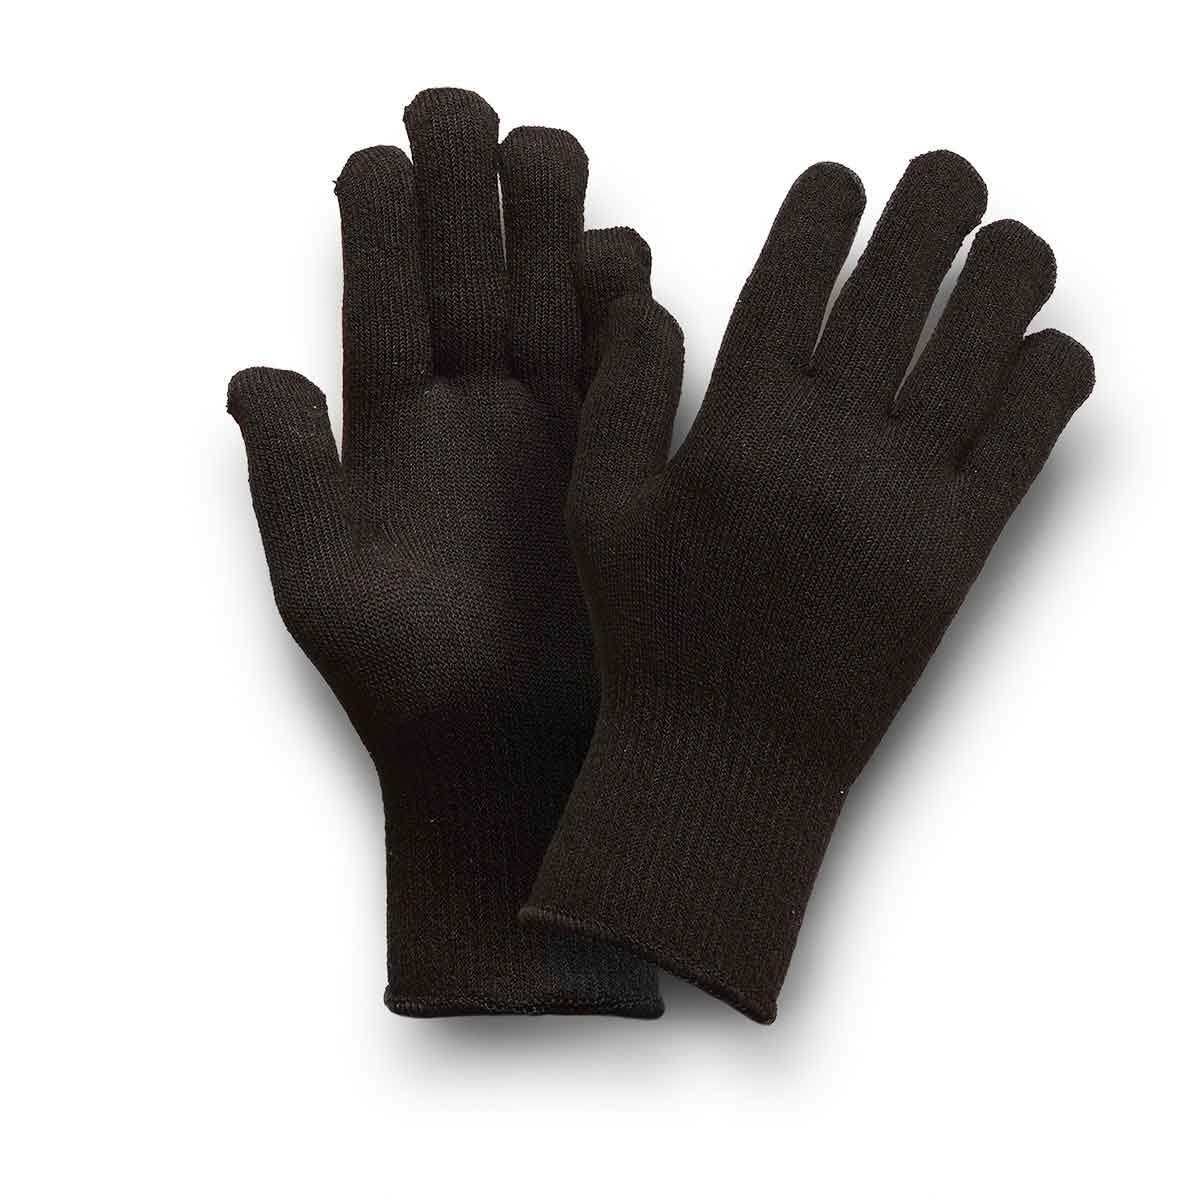 Lebon Coldskin Seamless Knitted Glove